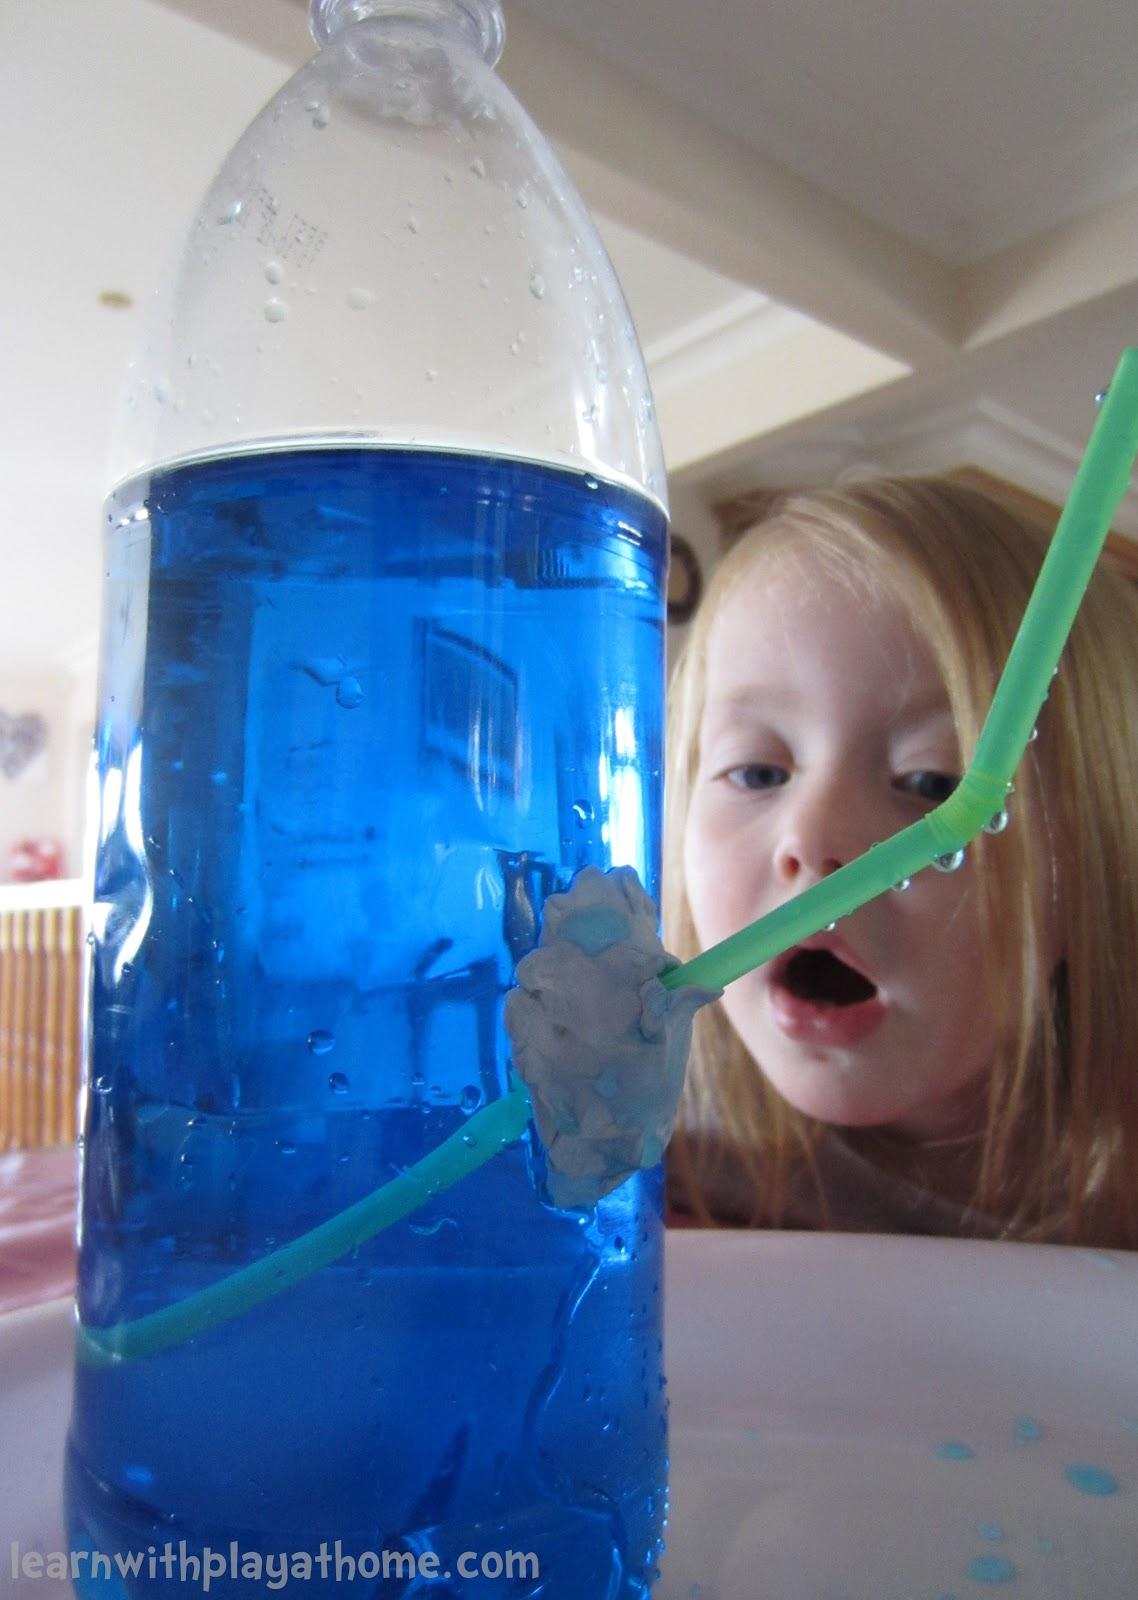 Drinking Water Making Fingers Bluie